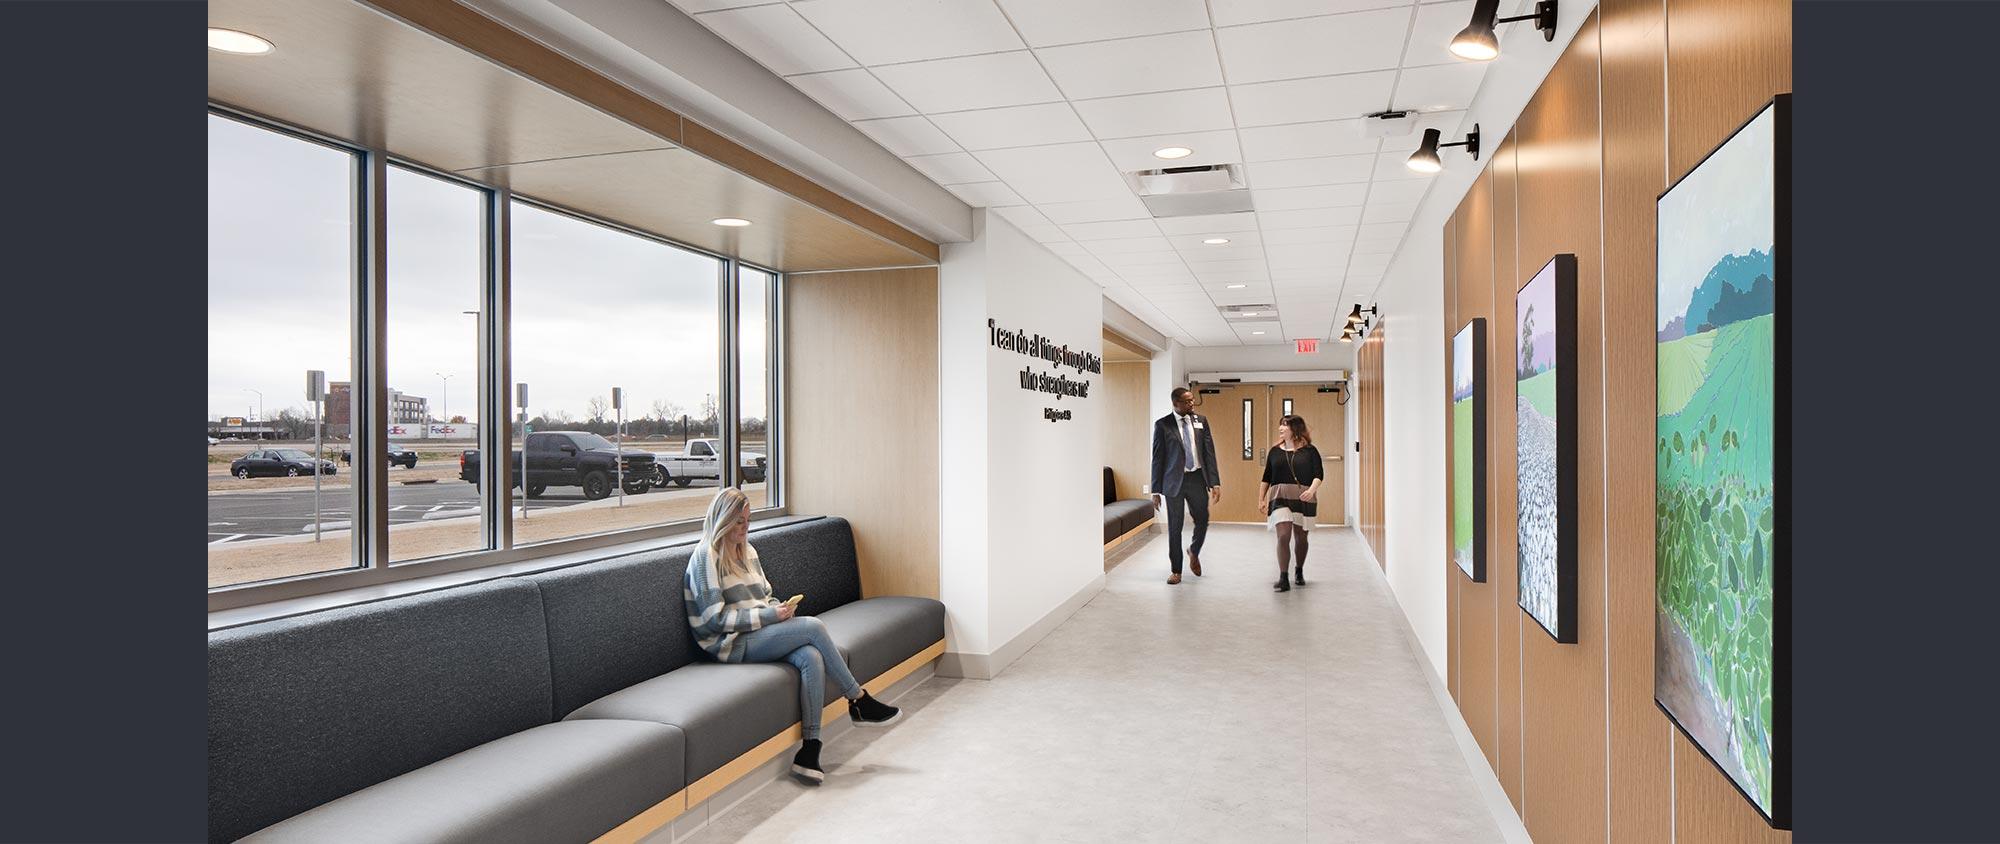 Baptist Memorial Hospital-Crittenden